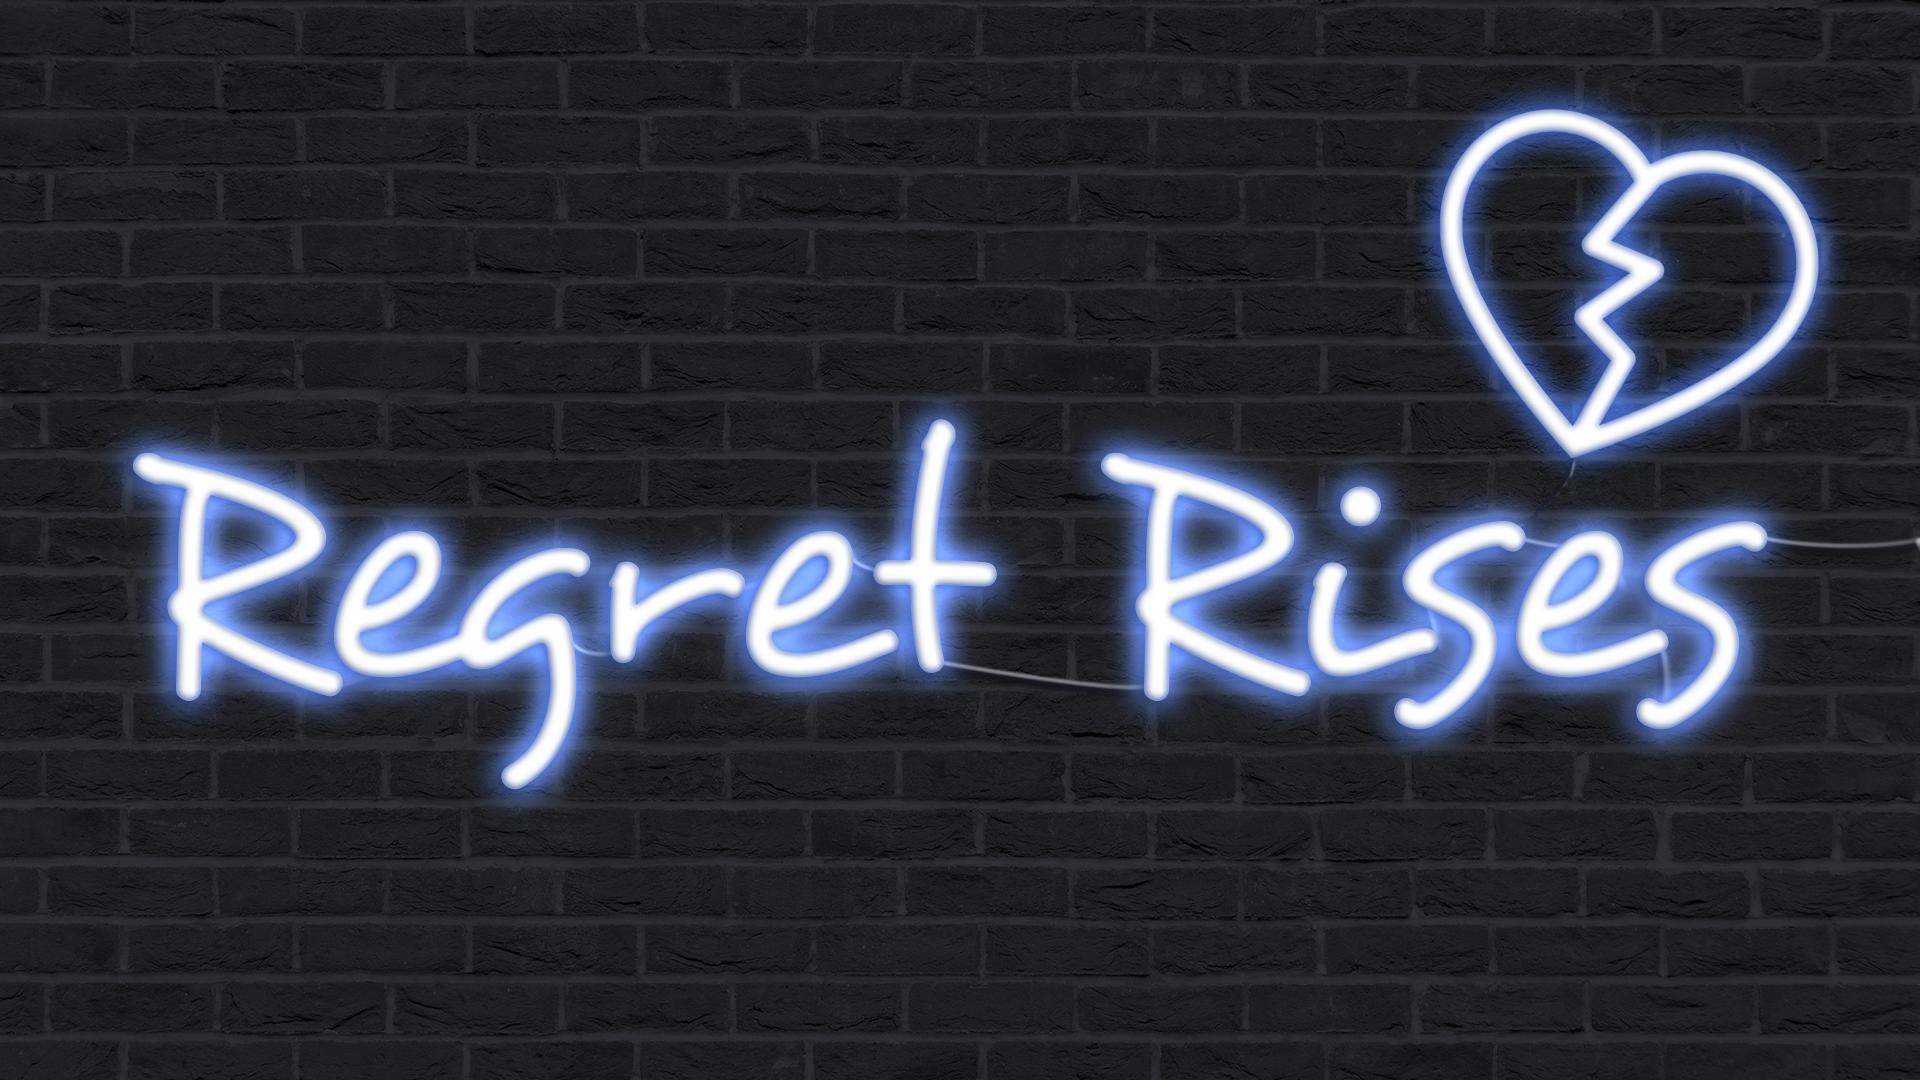 Regret Rises